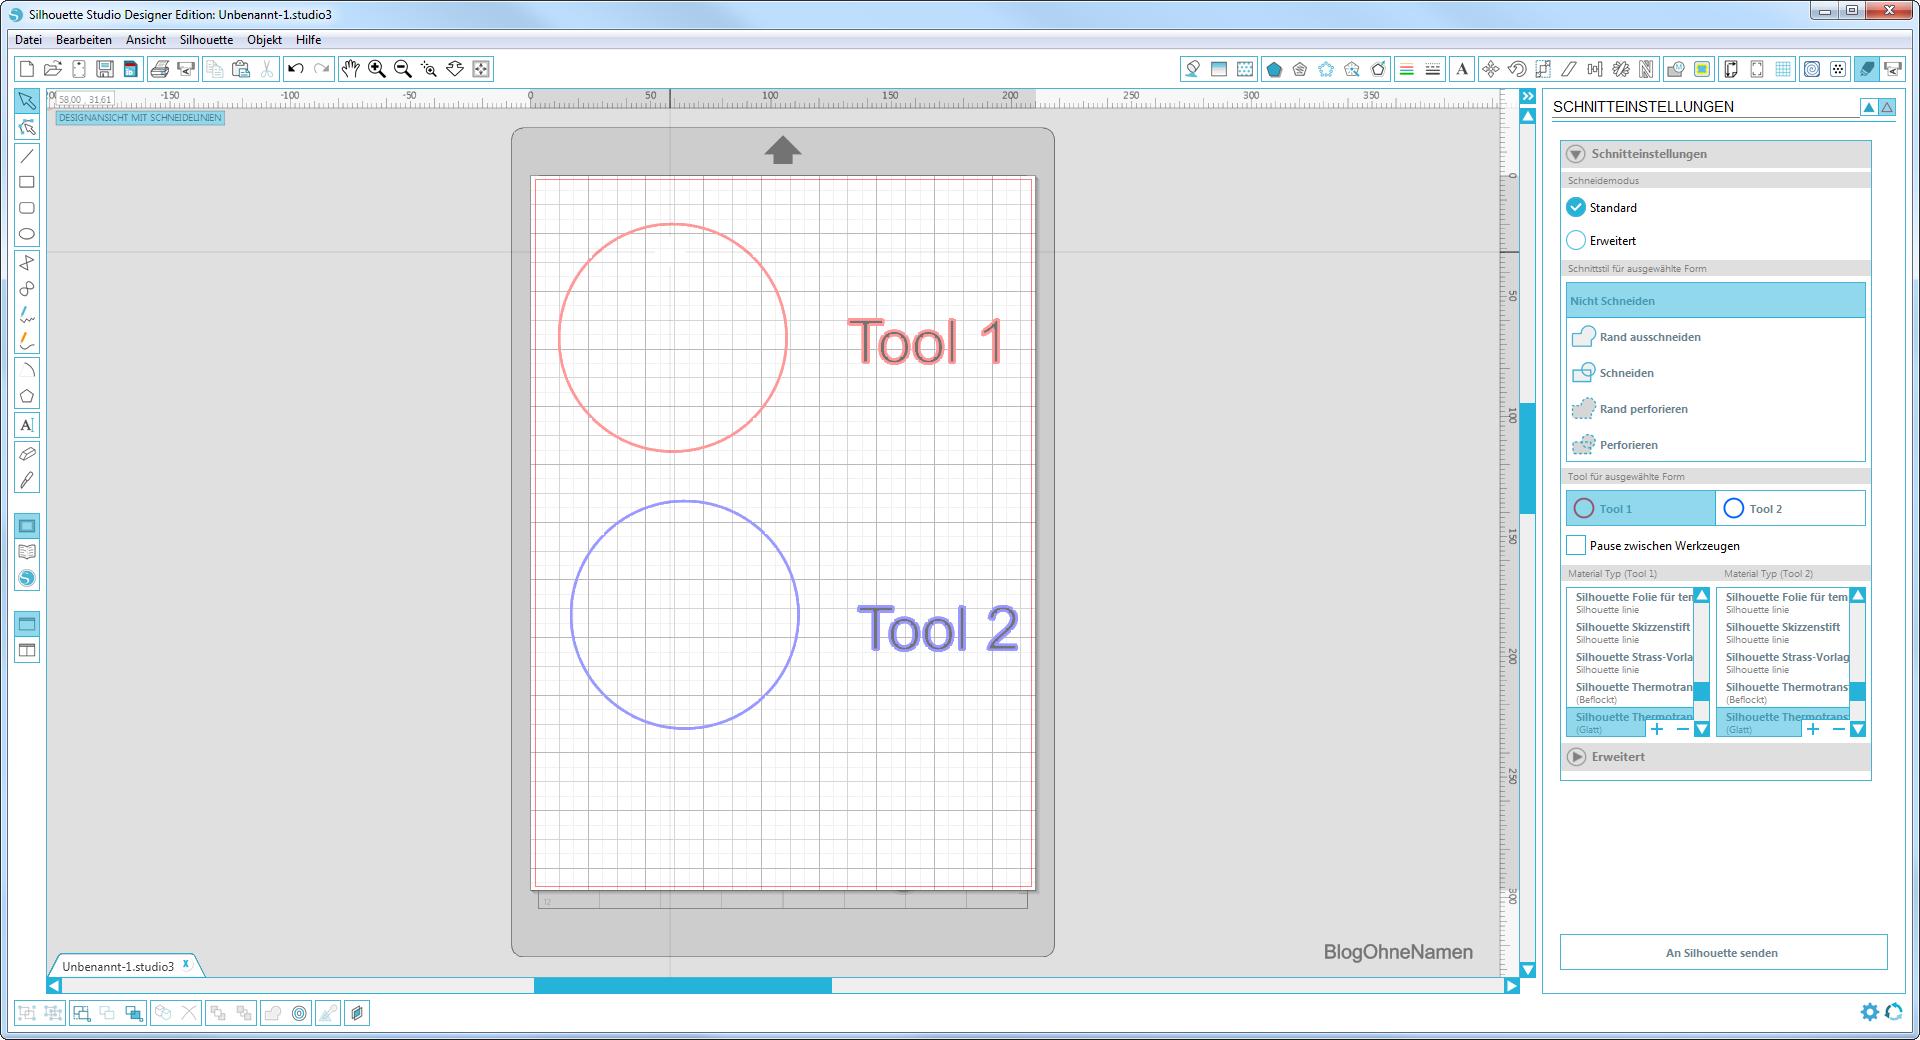 Tool 1 & Tool 2 im Vergleich